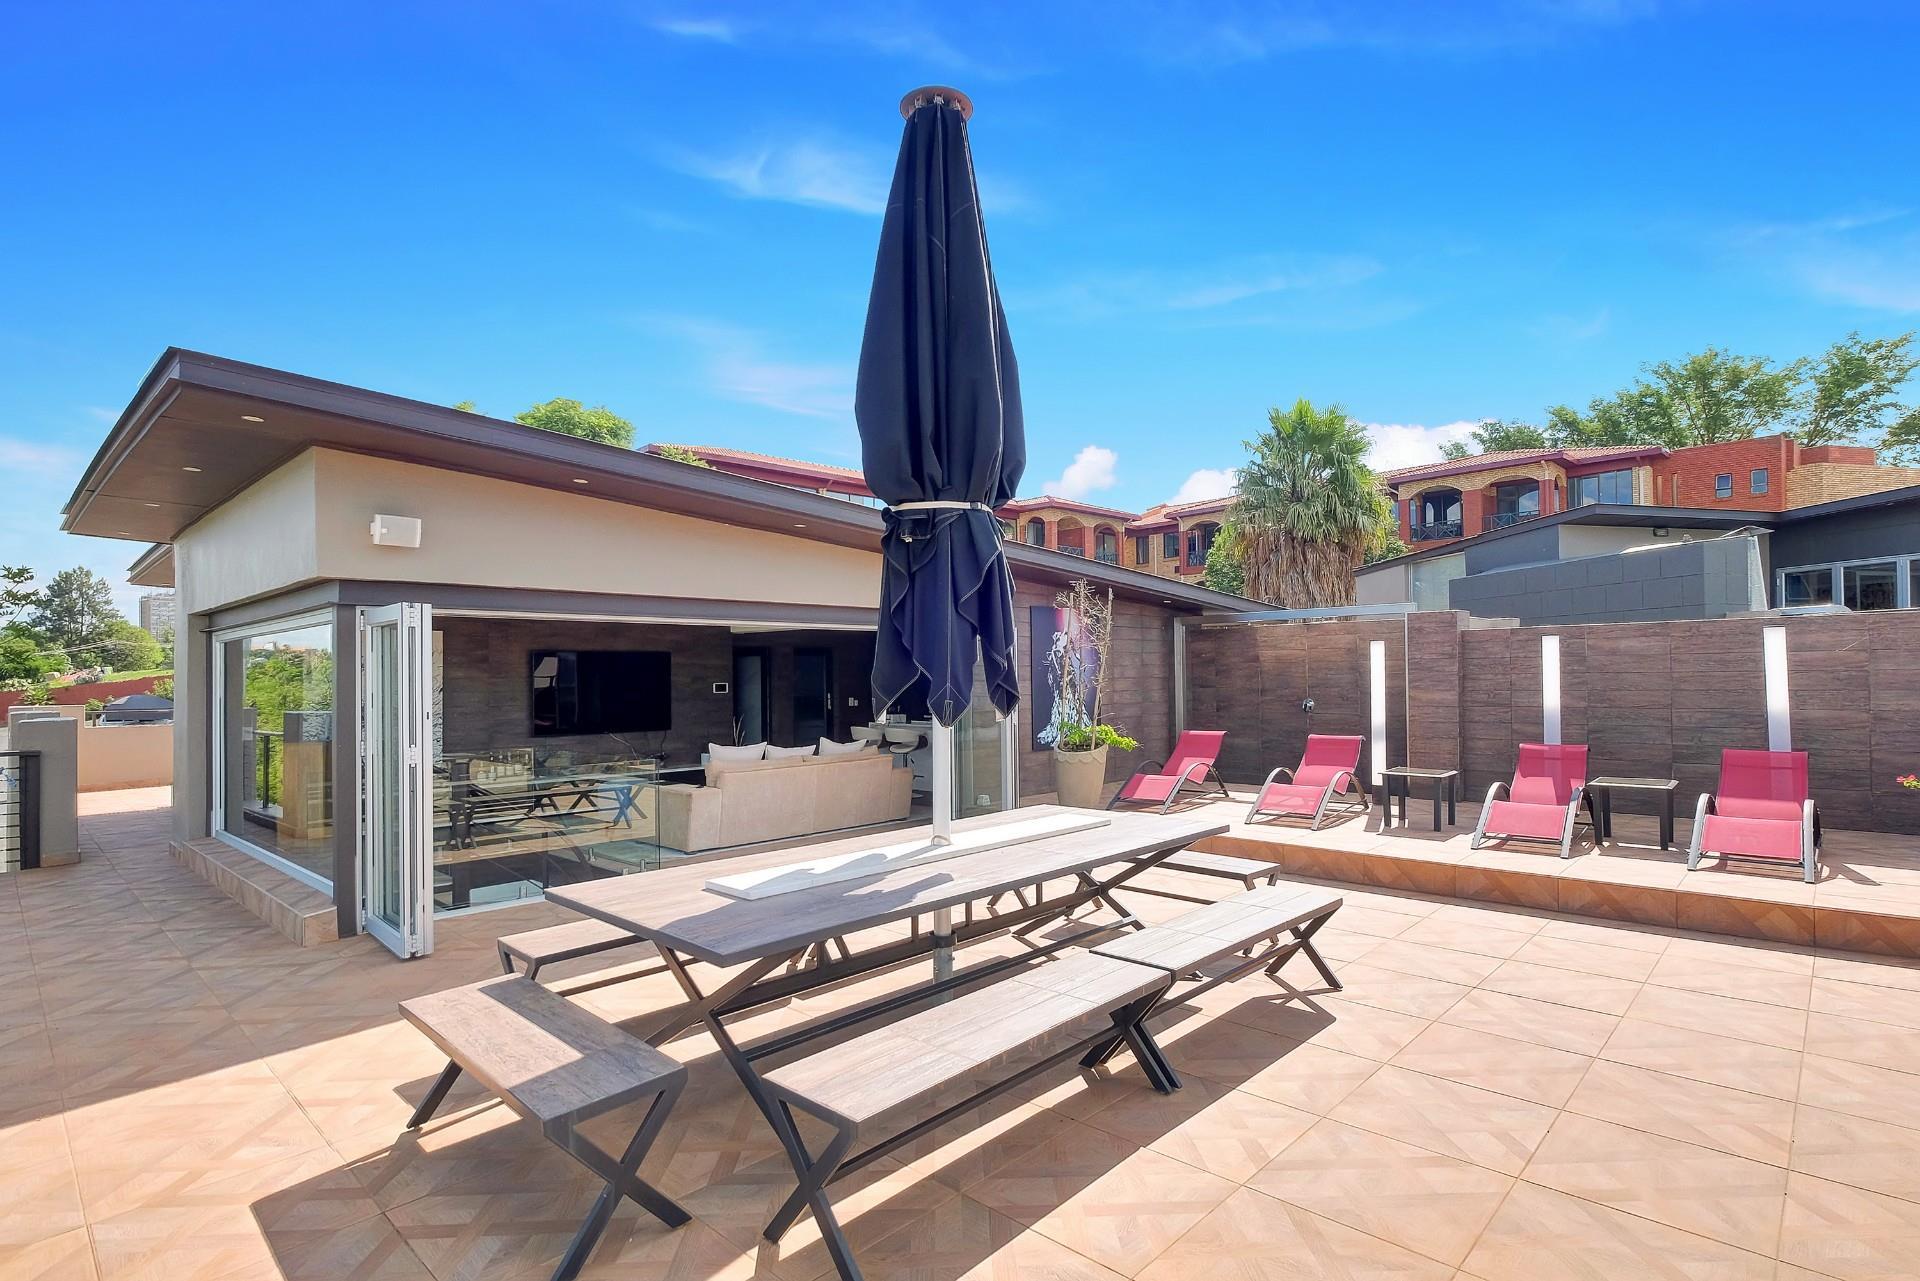 3 Bedroom Apartment / Flat For Sale in Hurlingham Manor